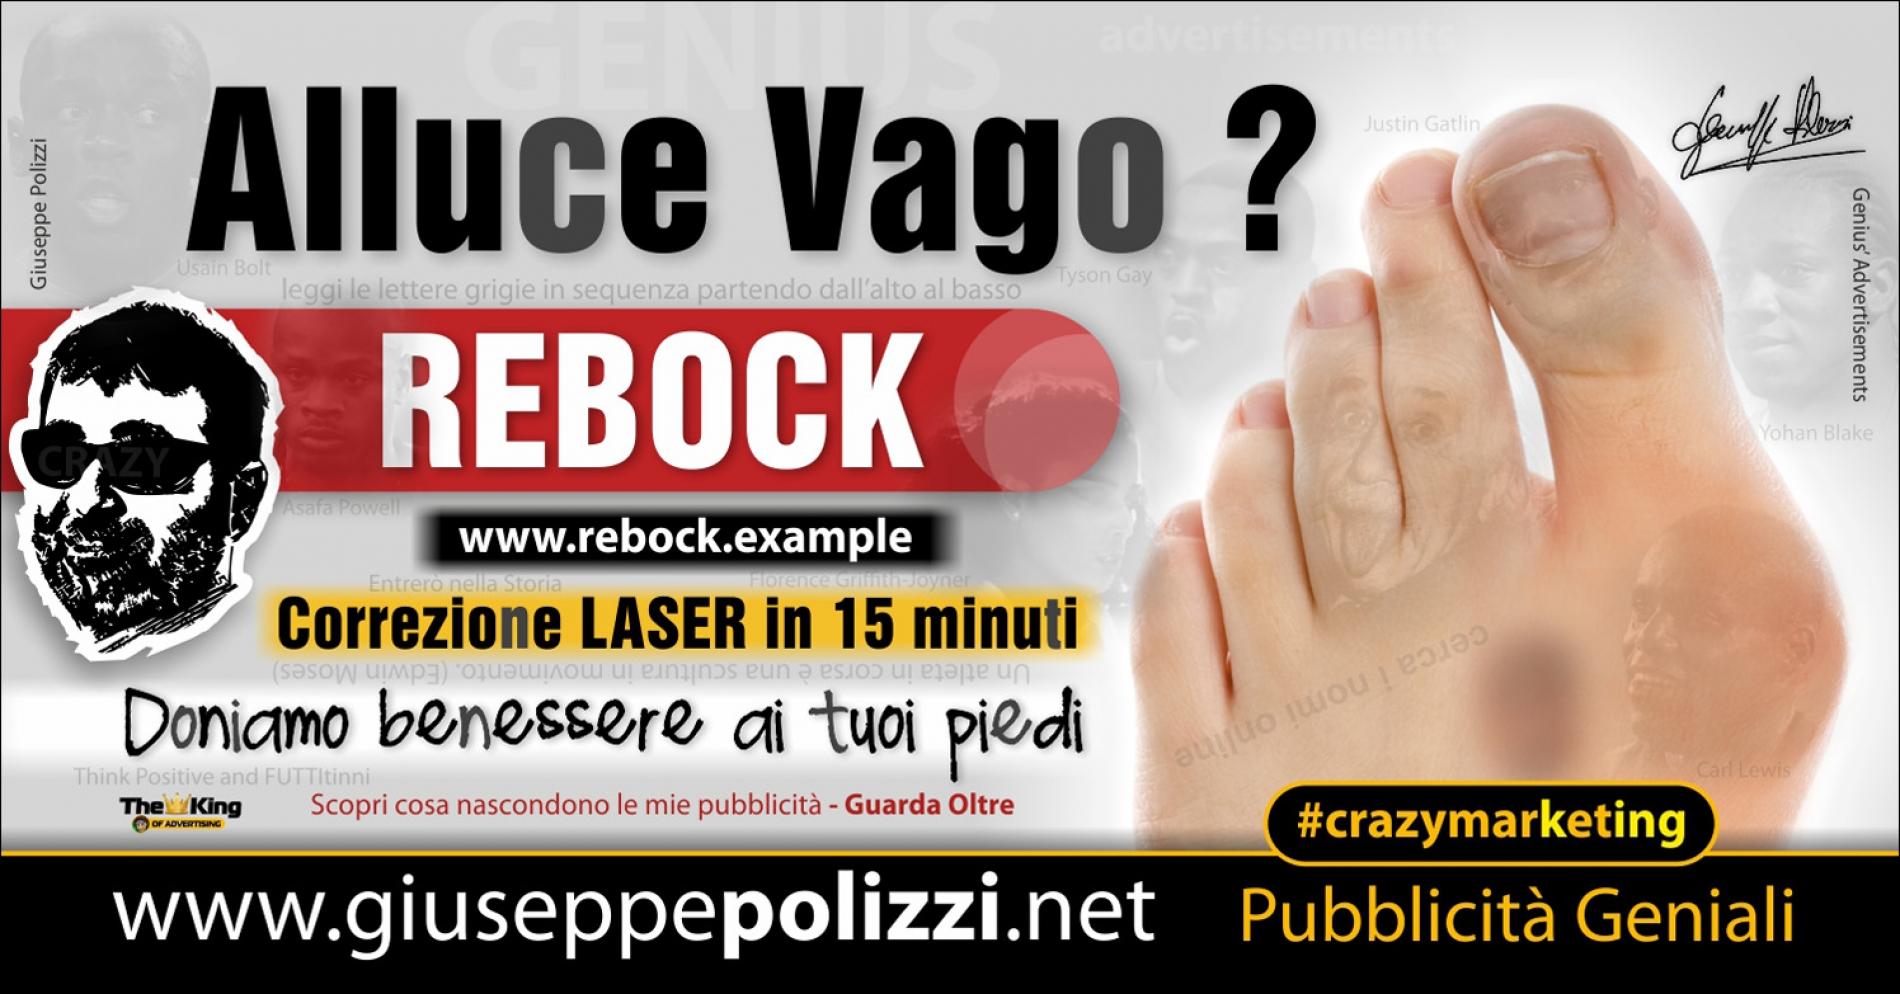 giuseppe Polizzi Alluce Vago crazymarketing pubblicita geniali